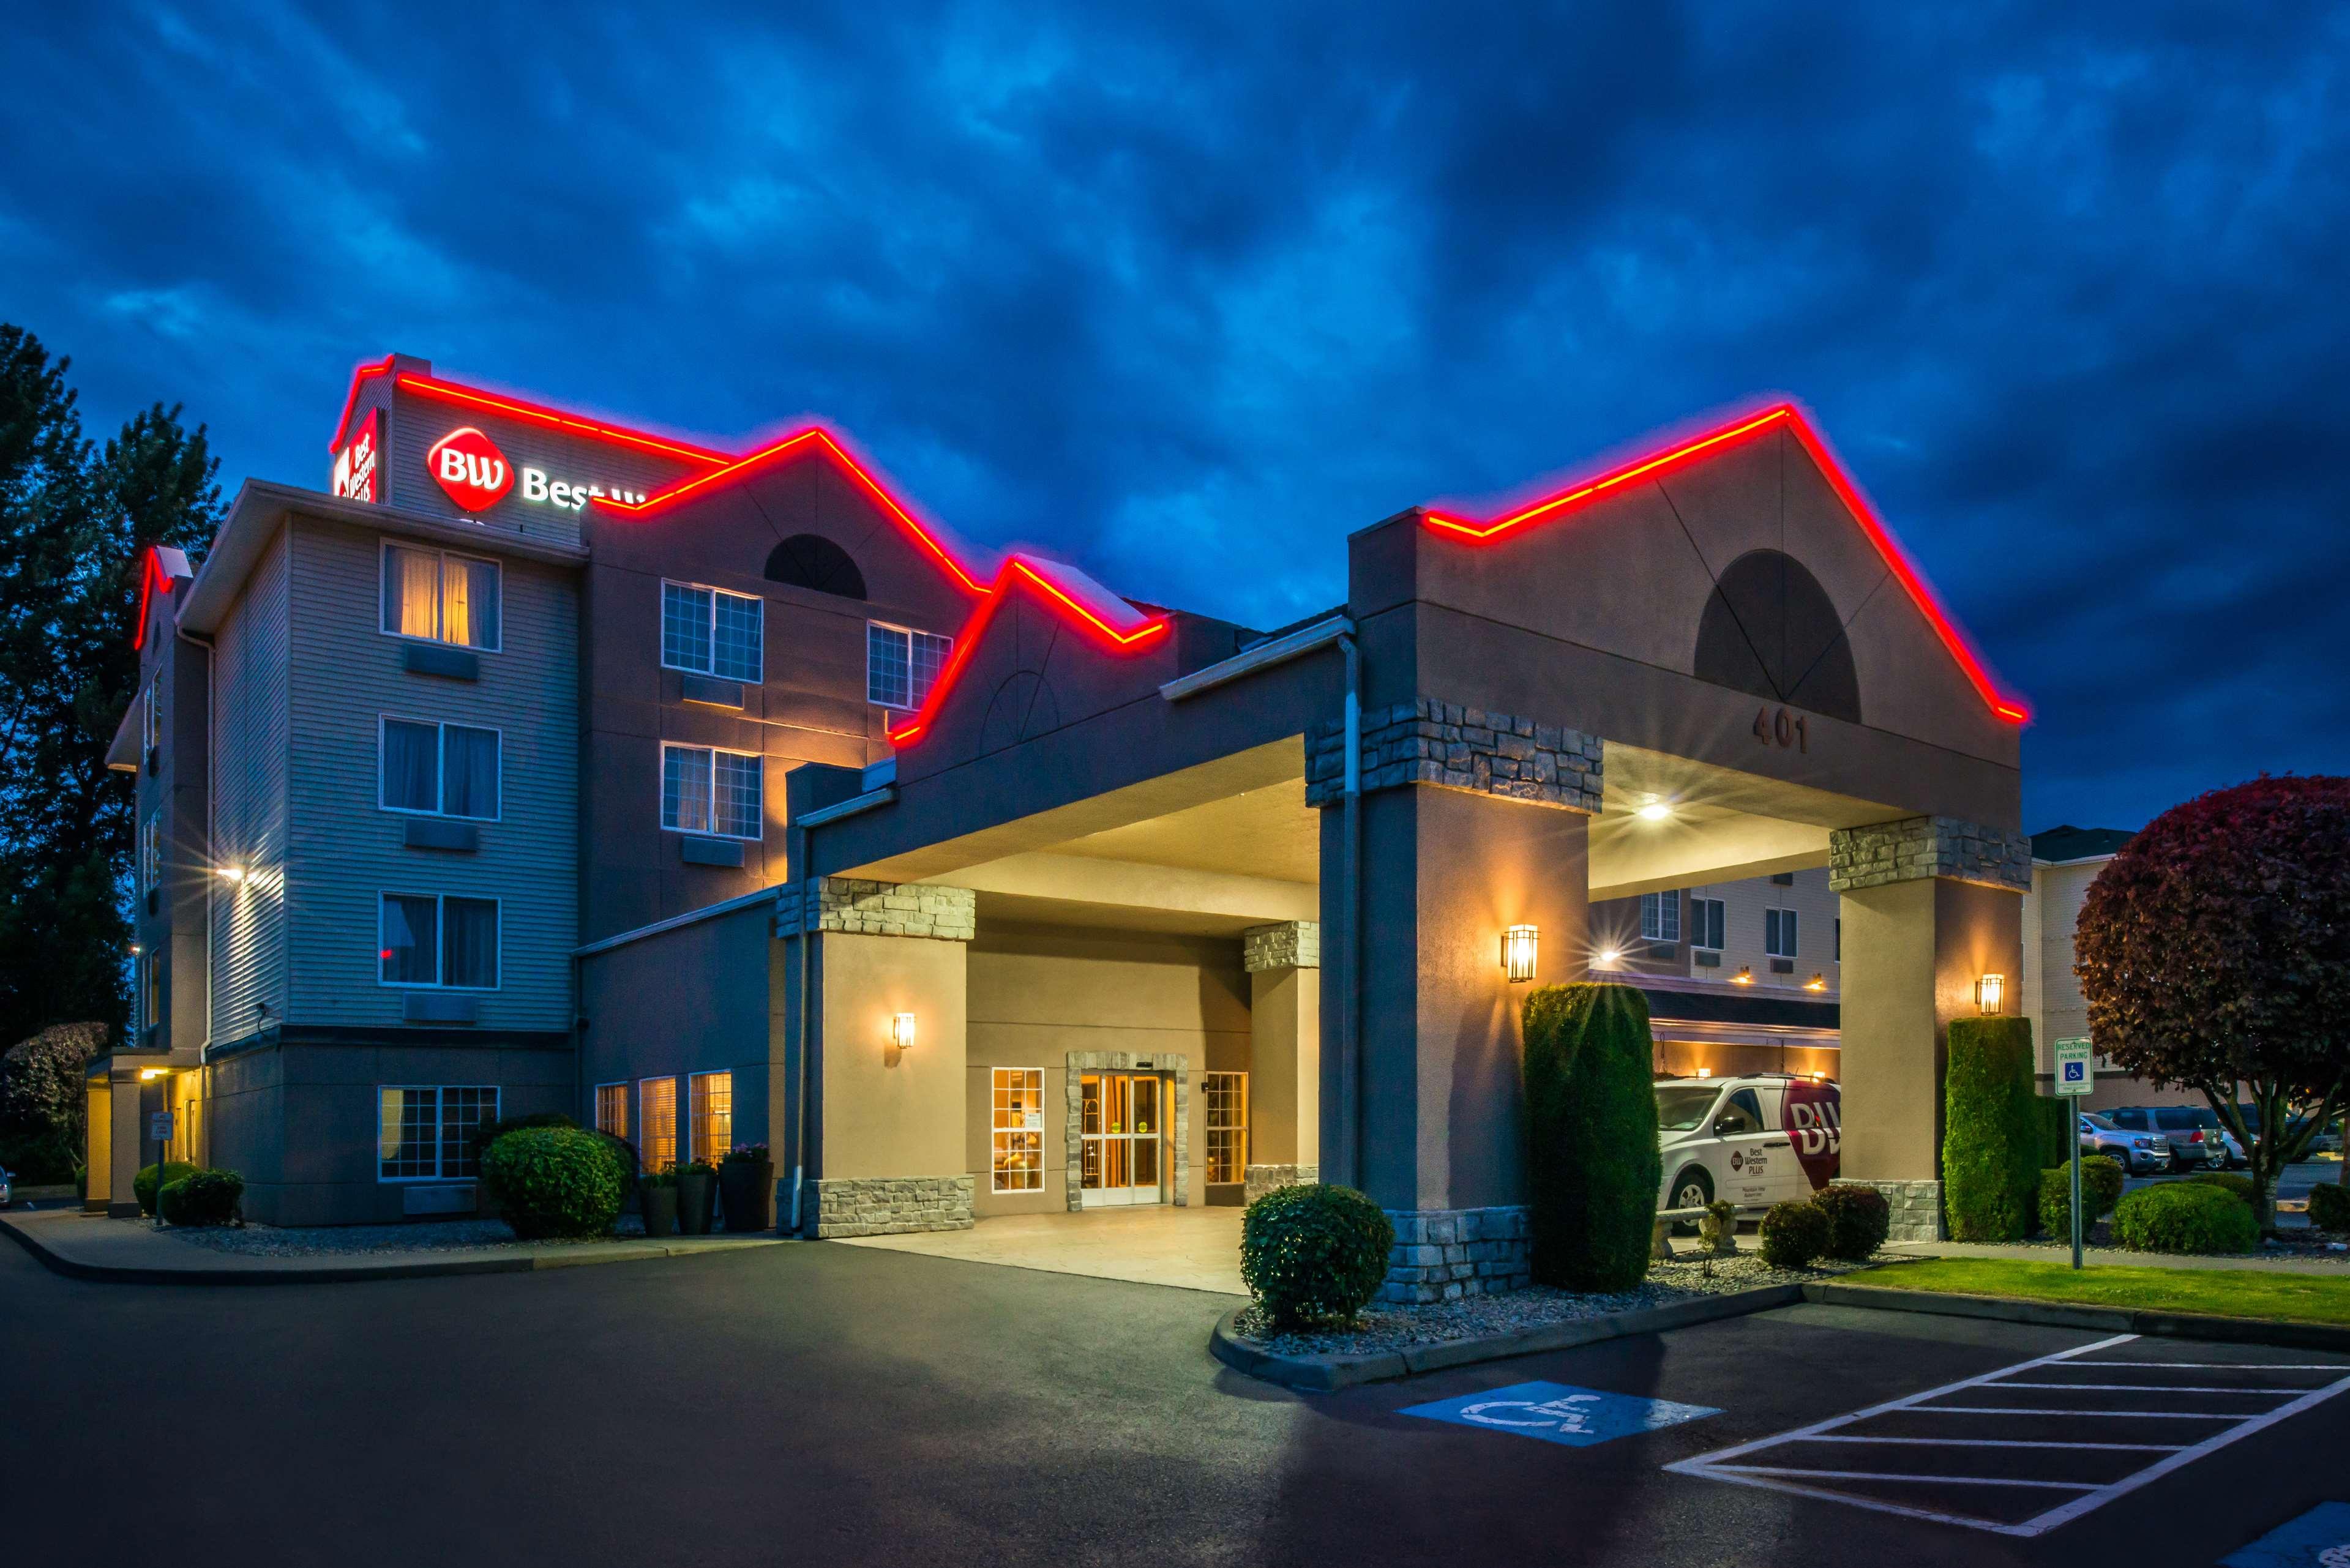 Best Western Plus Mountain View Auburn Inn image 1